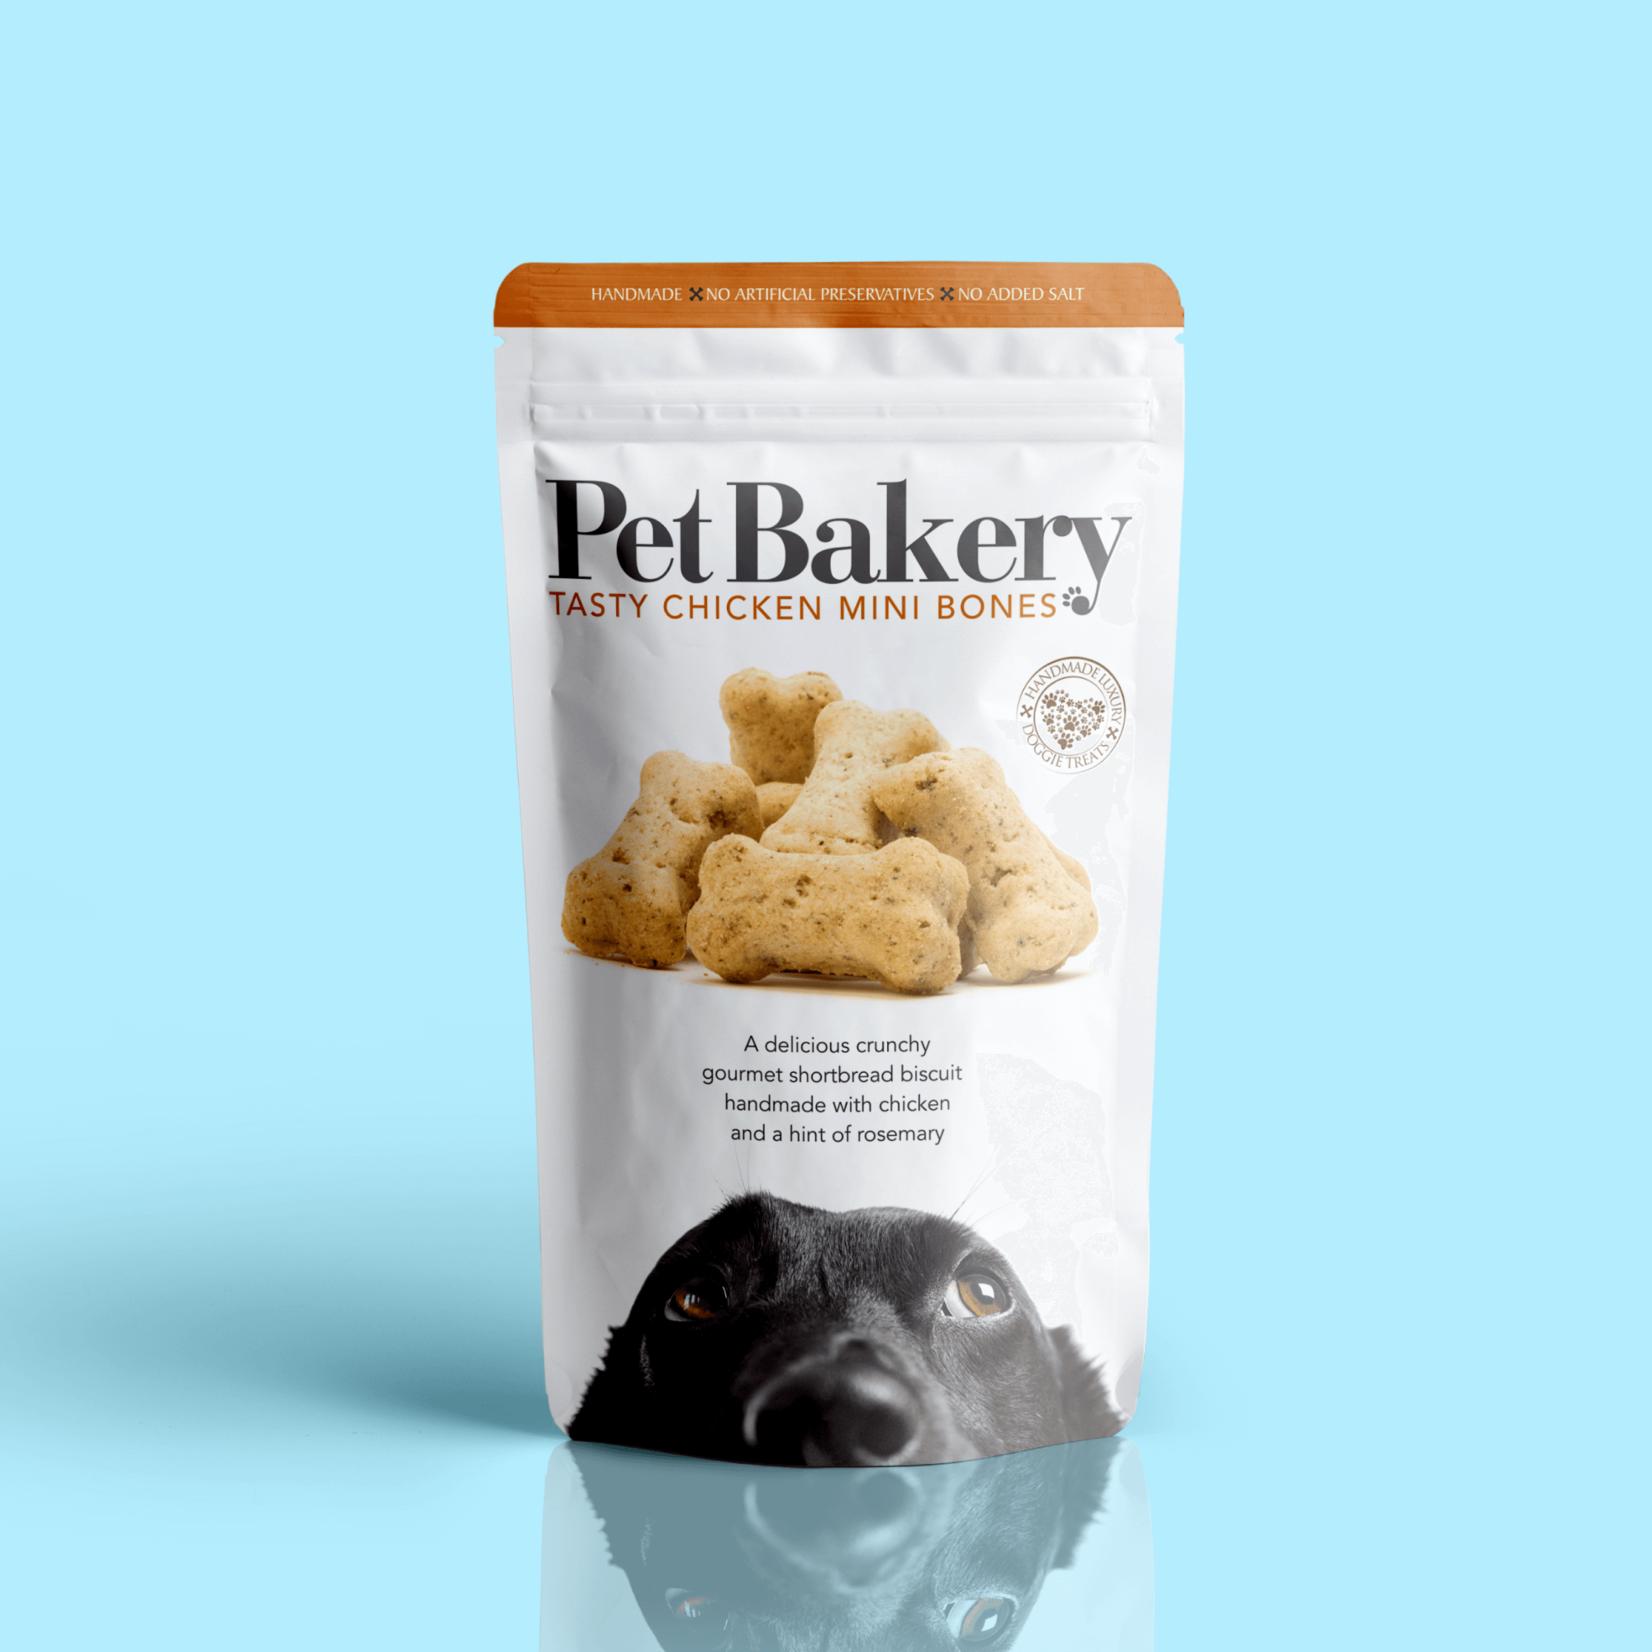 Pet Bakery Tasty Chicken Mini Bones Dog Treats, 190g